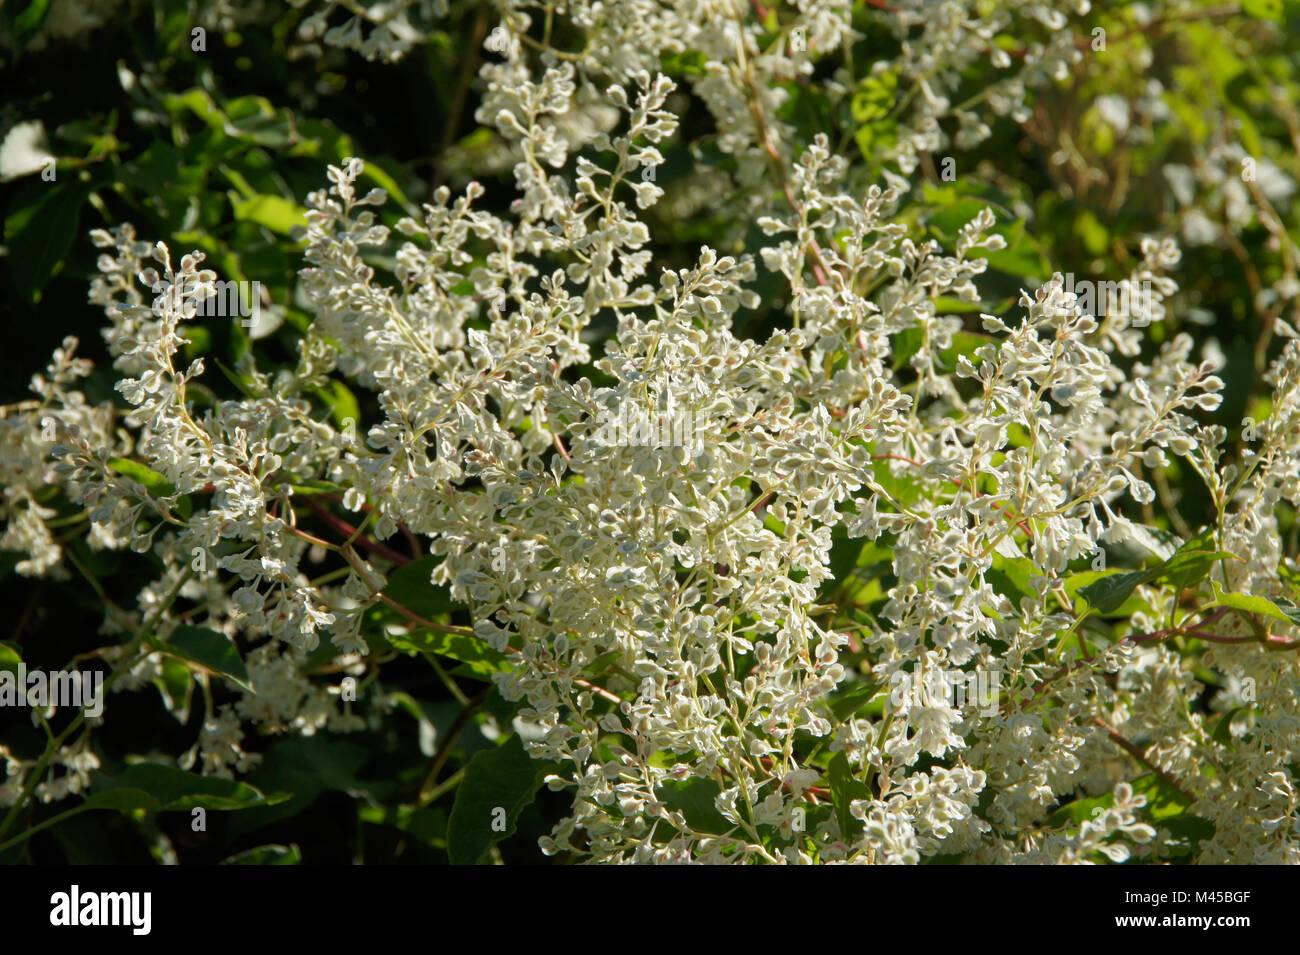 Polygonum baldschuanicum, Syn. Fallopia aubertii, Knotweed - Stock Image